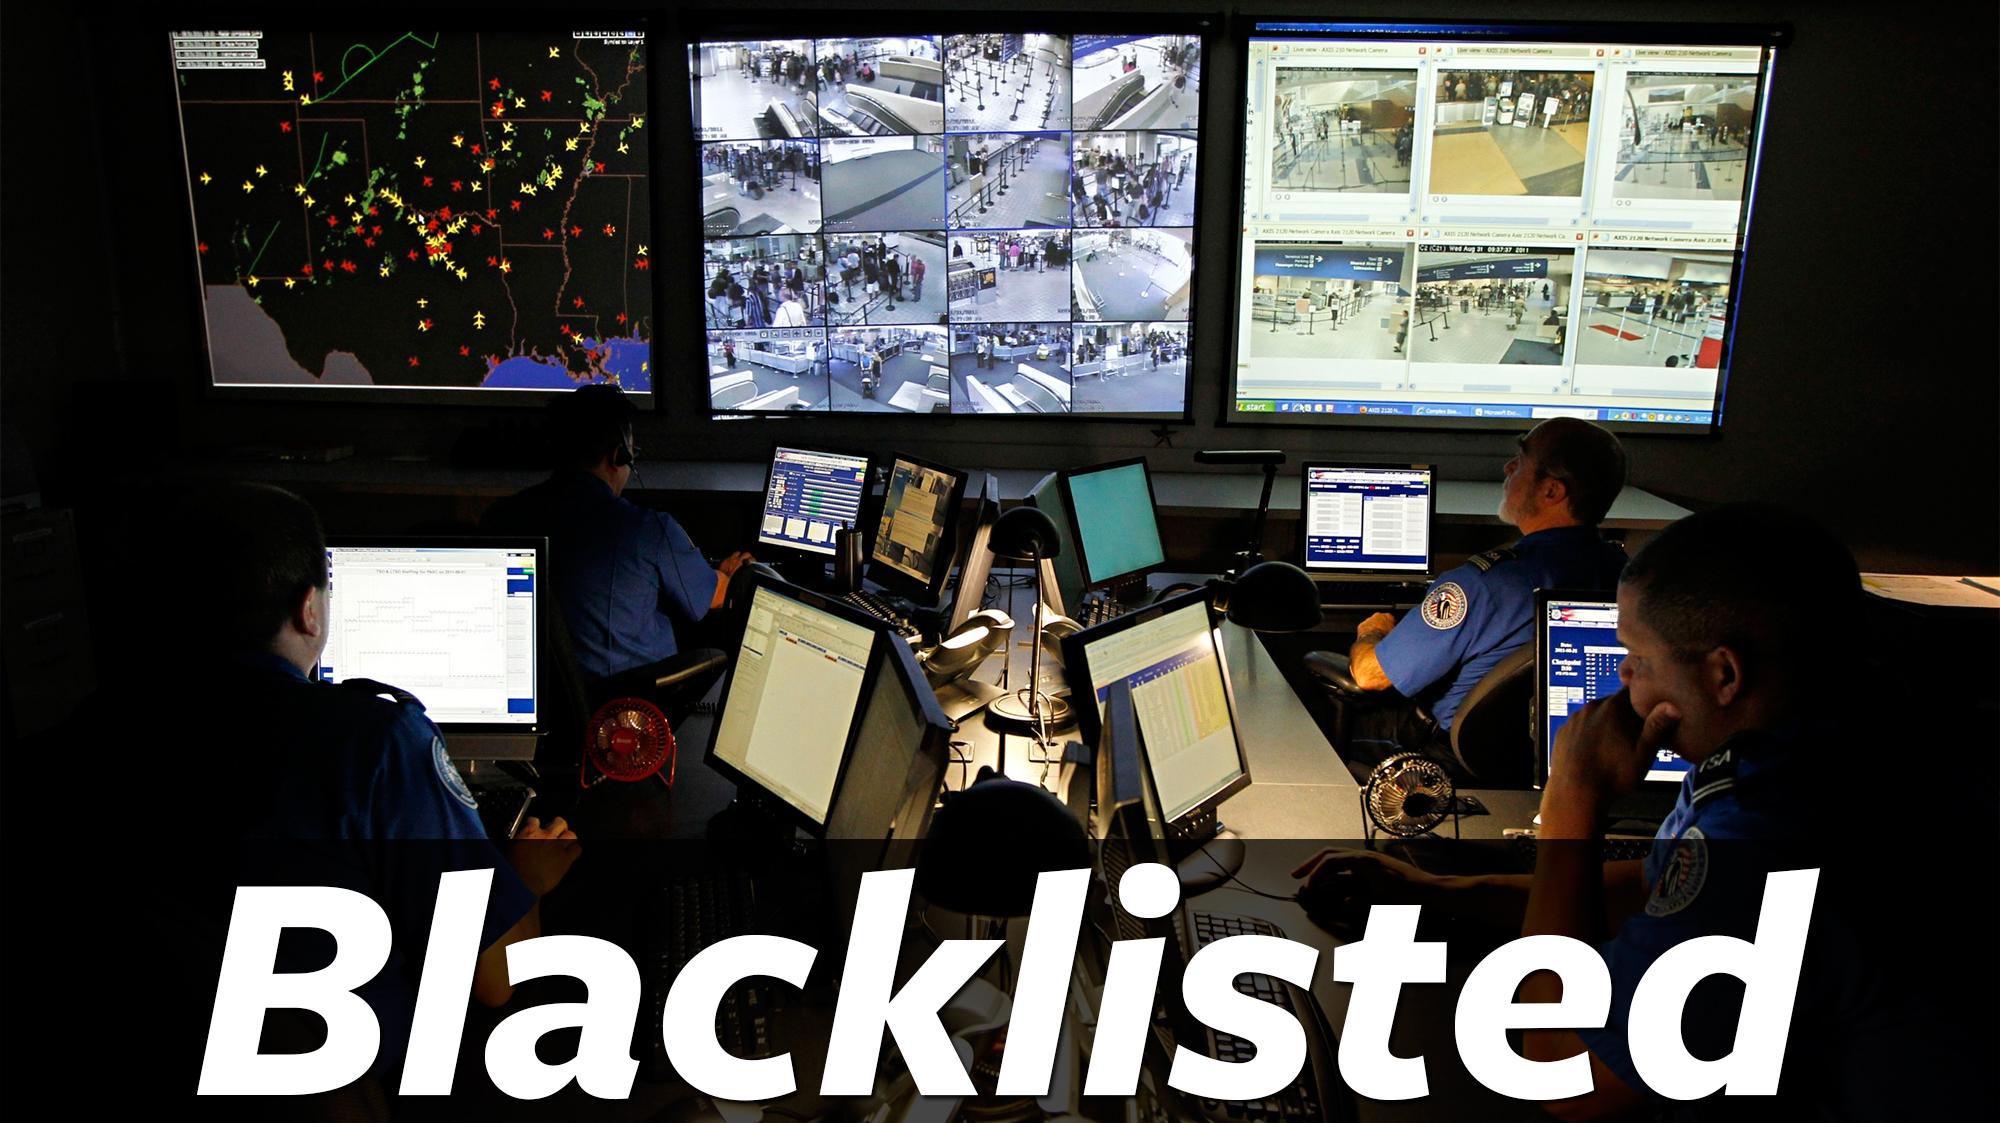 blacklisted_title